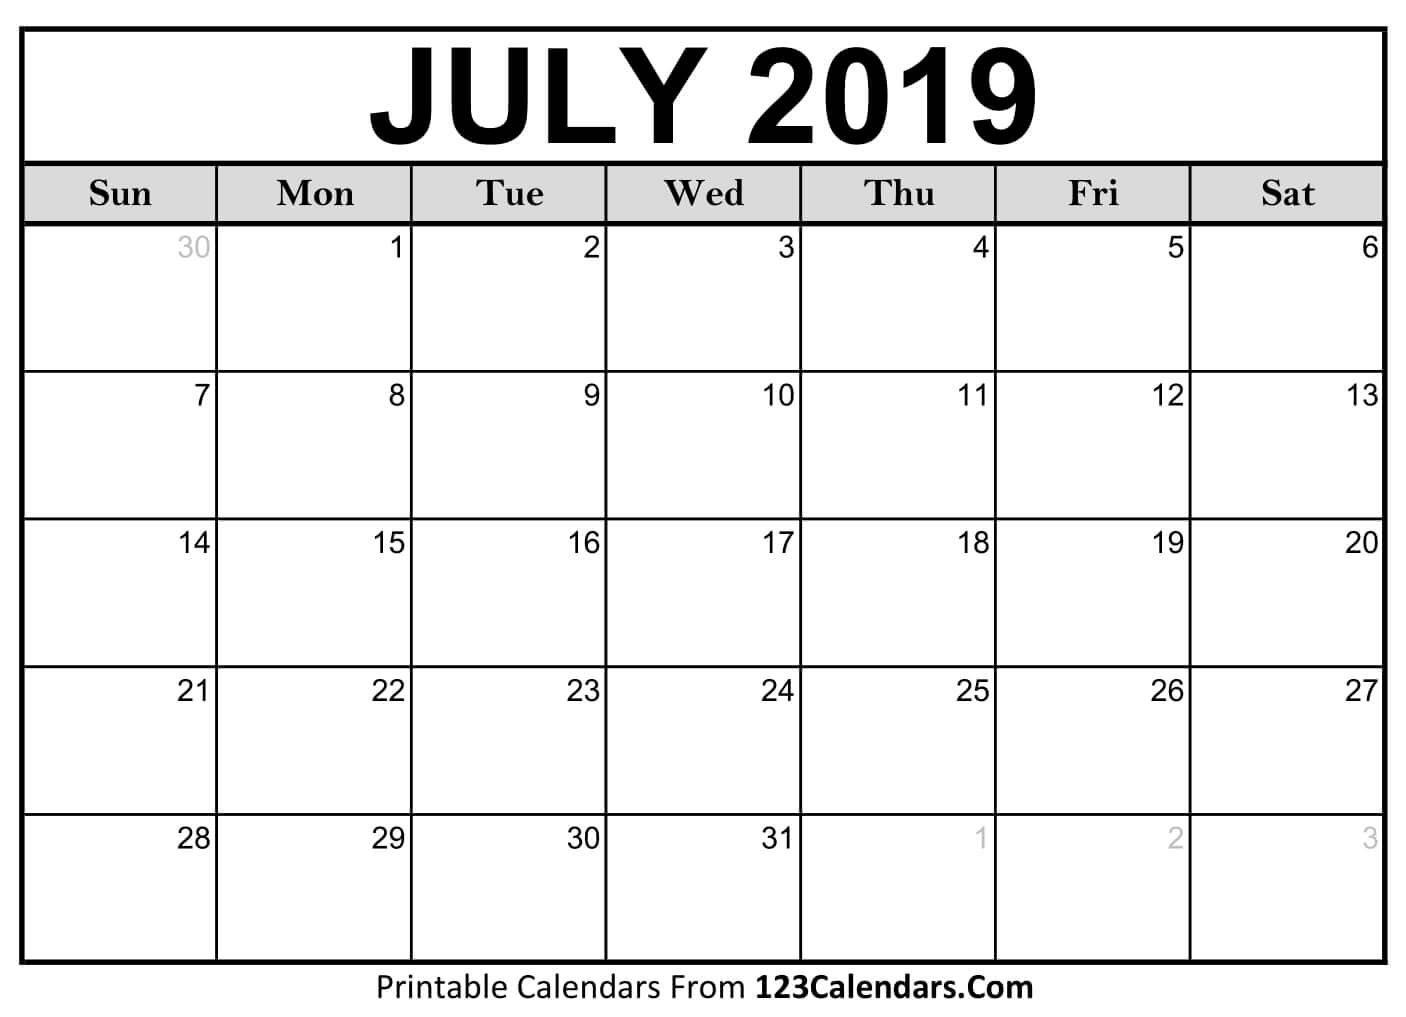 Printable July 2019 Calendar Templates - 123Calendars Calendar Of 2019 July